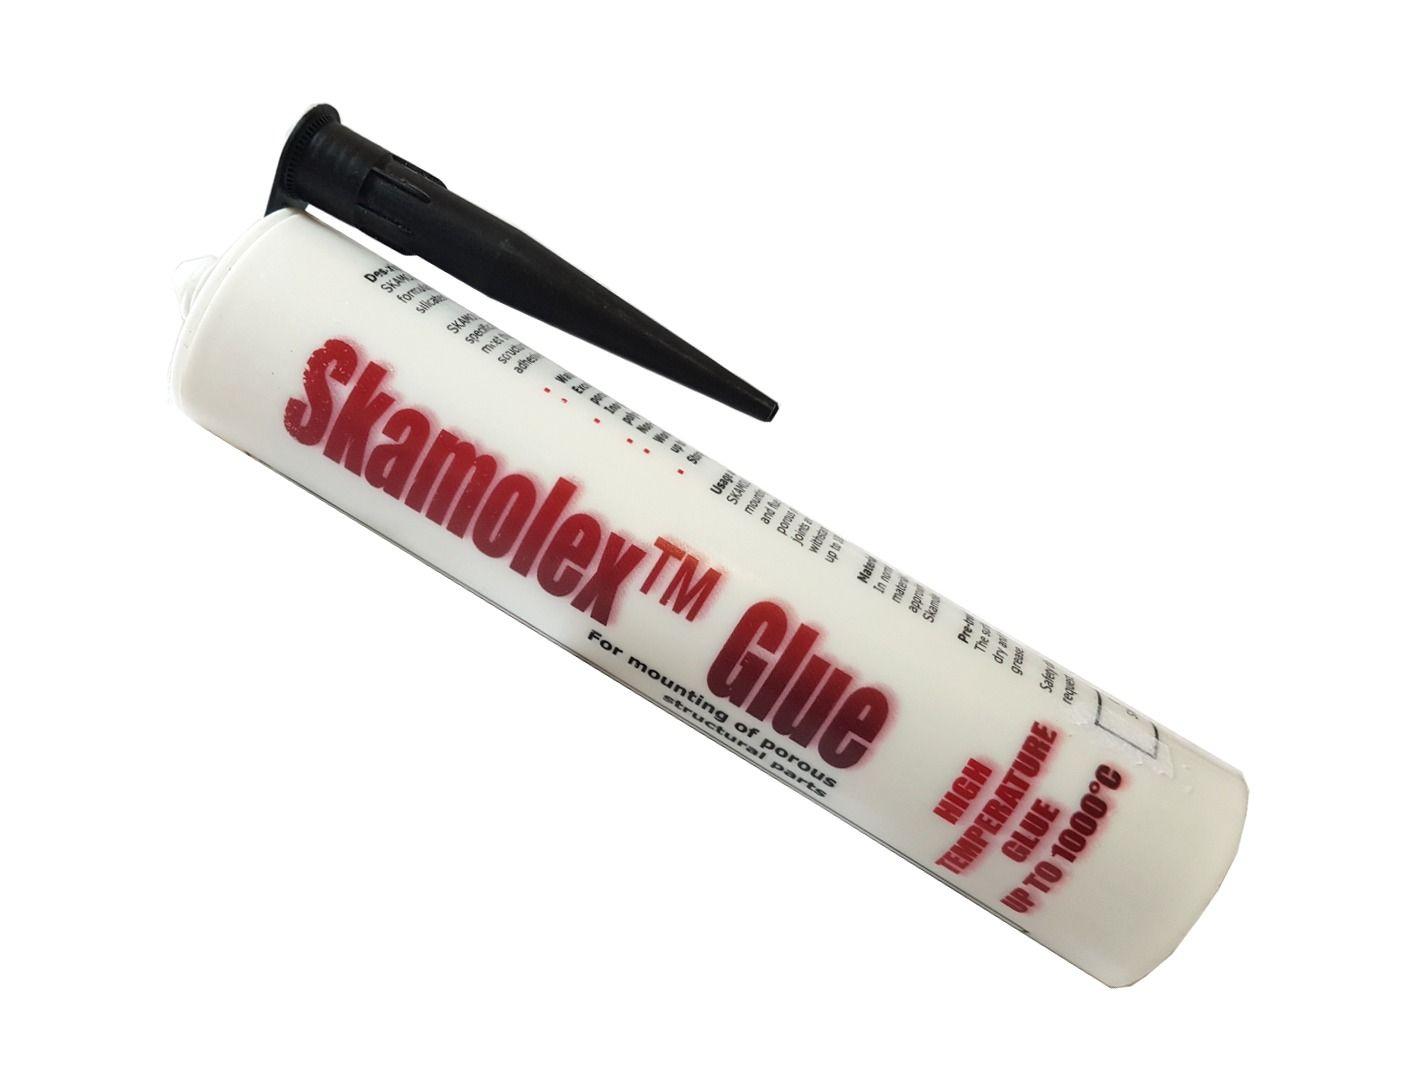 lepidlo SKAMOLEX GLUE - kartuš 310 ml Silaterm